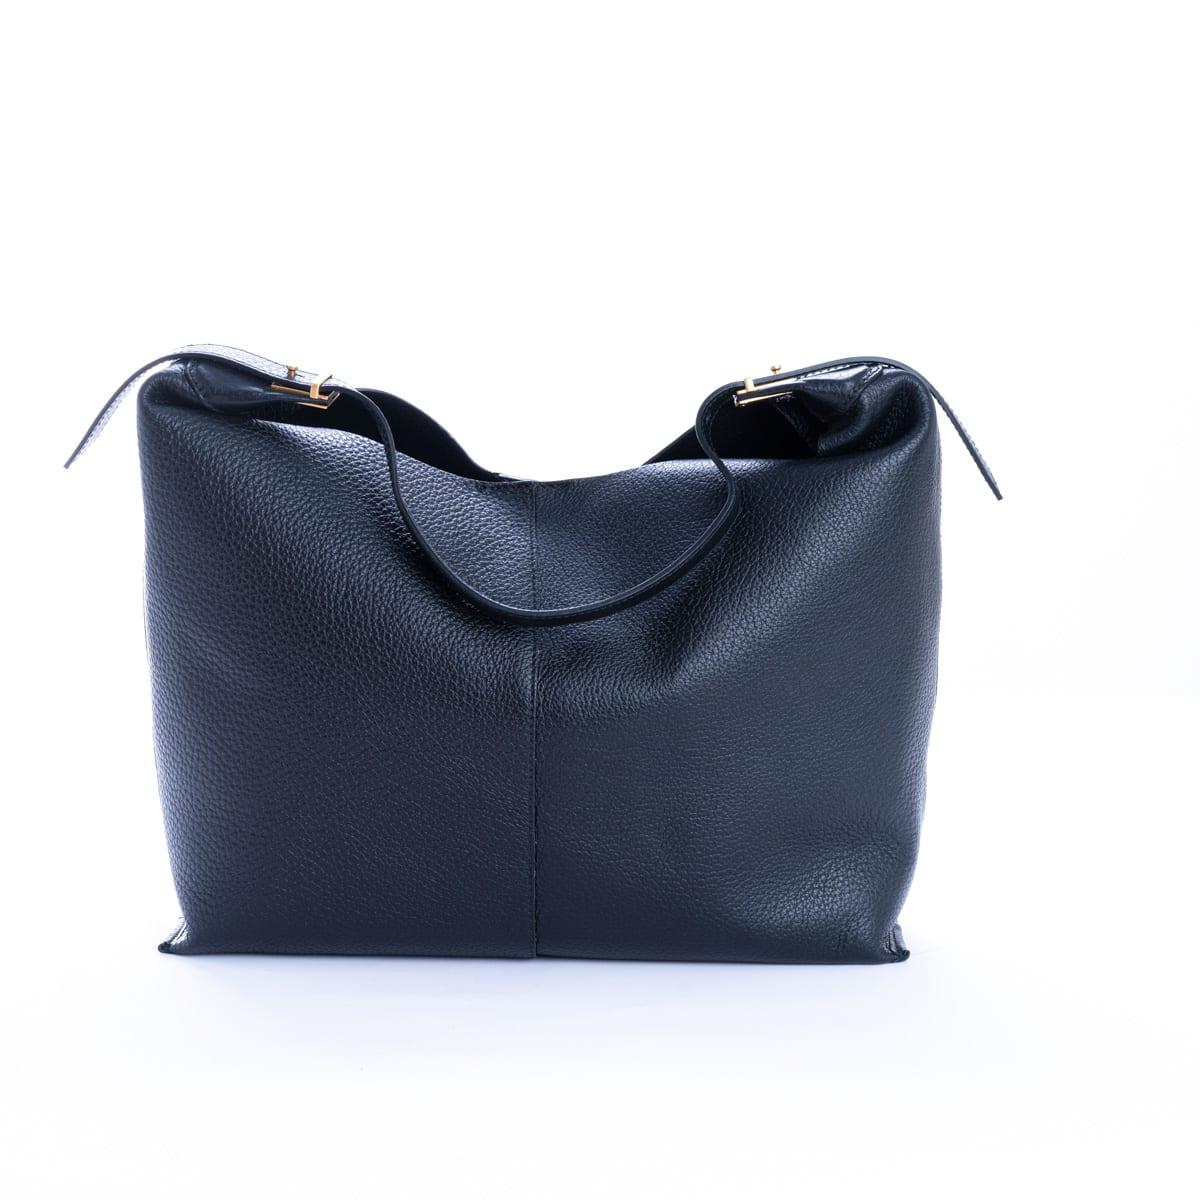 Gianni Chiarini Gianni Chiarini Lisa Bag